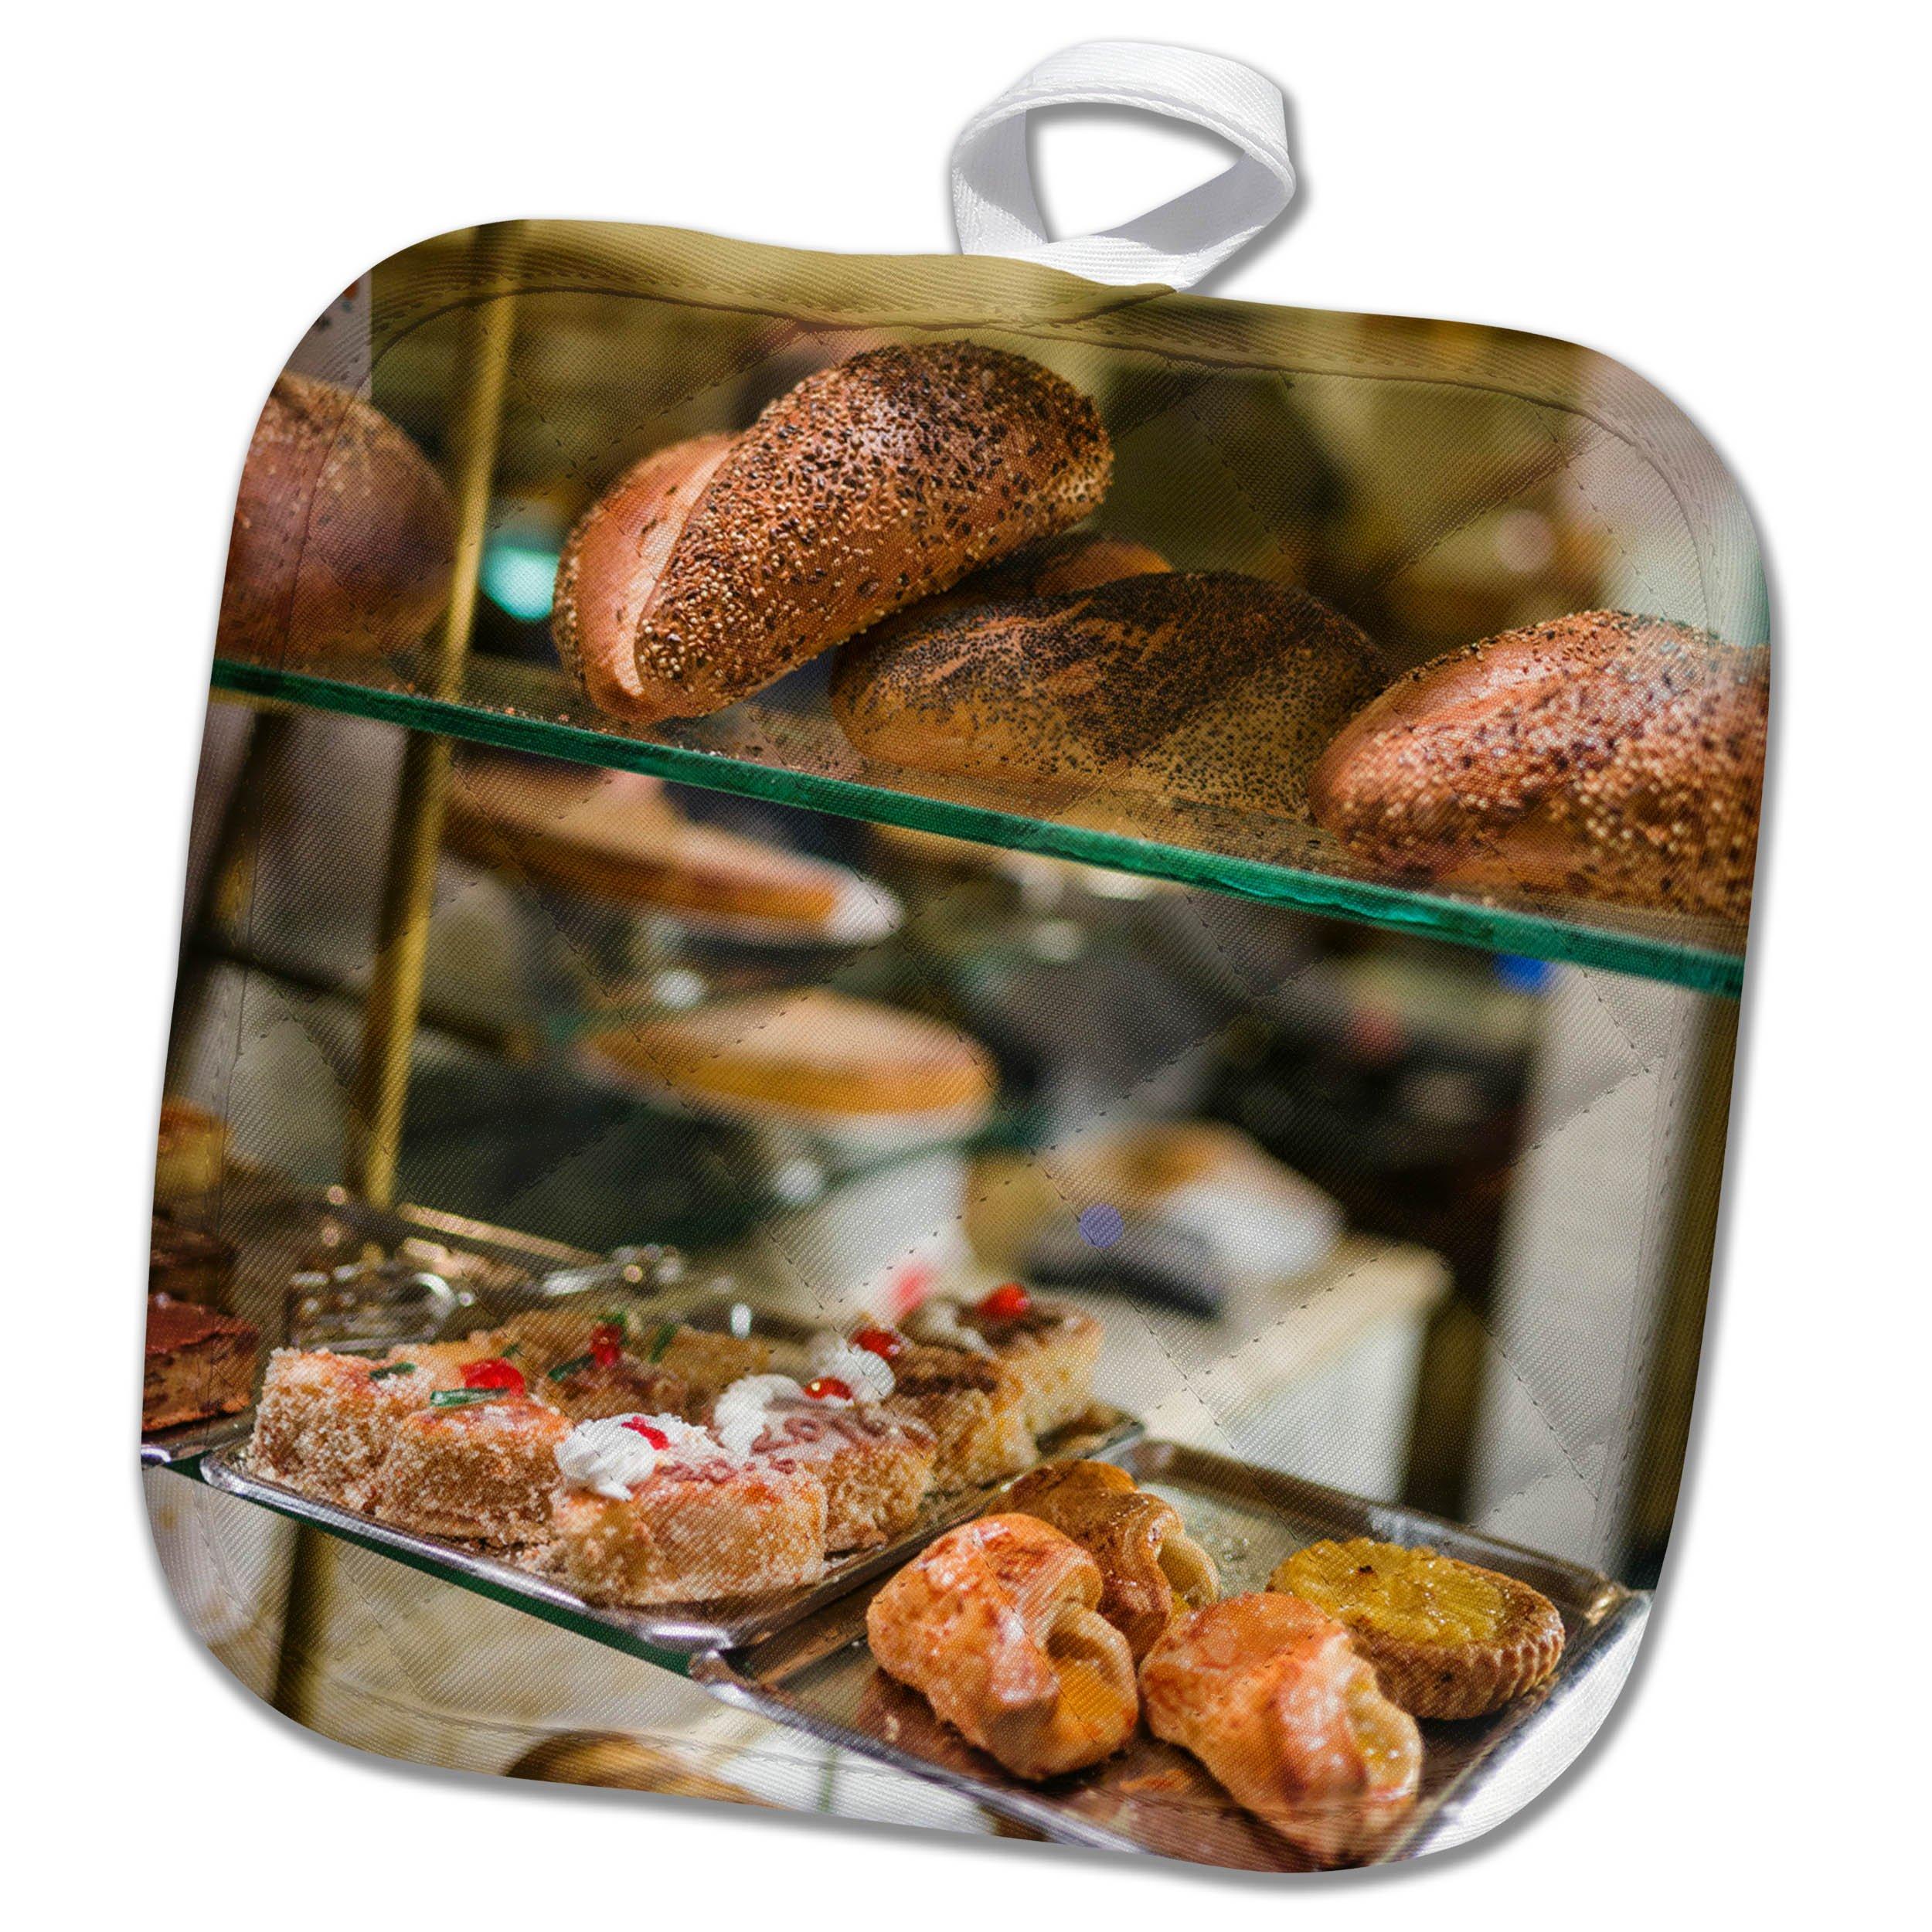 3dRose Danita Delimont - Food - Belgium, Antwerp. Shopping district, bakery window - 8x8 Potholder (phl_277300_1)